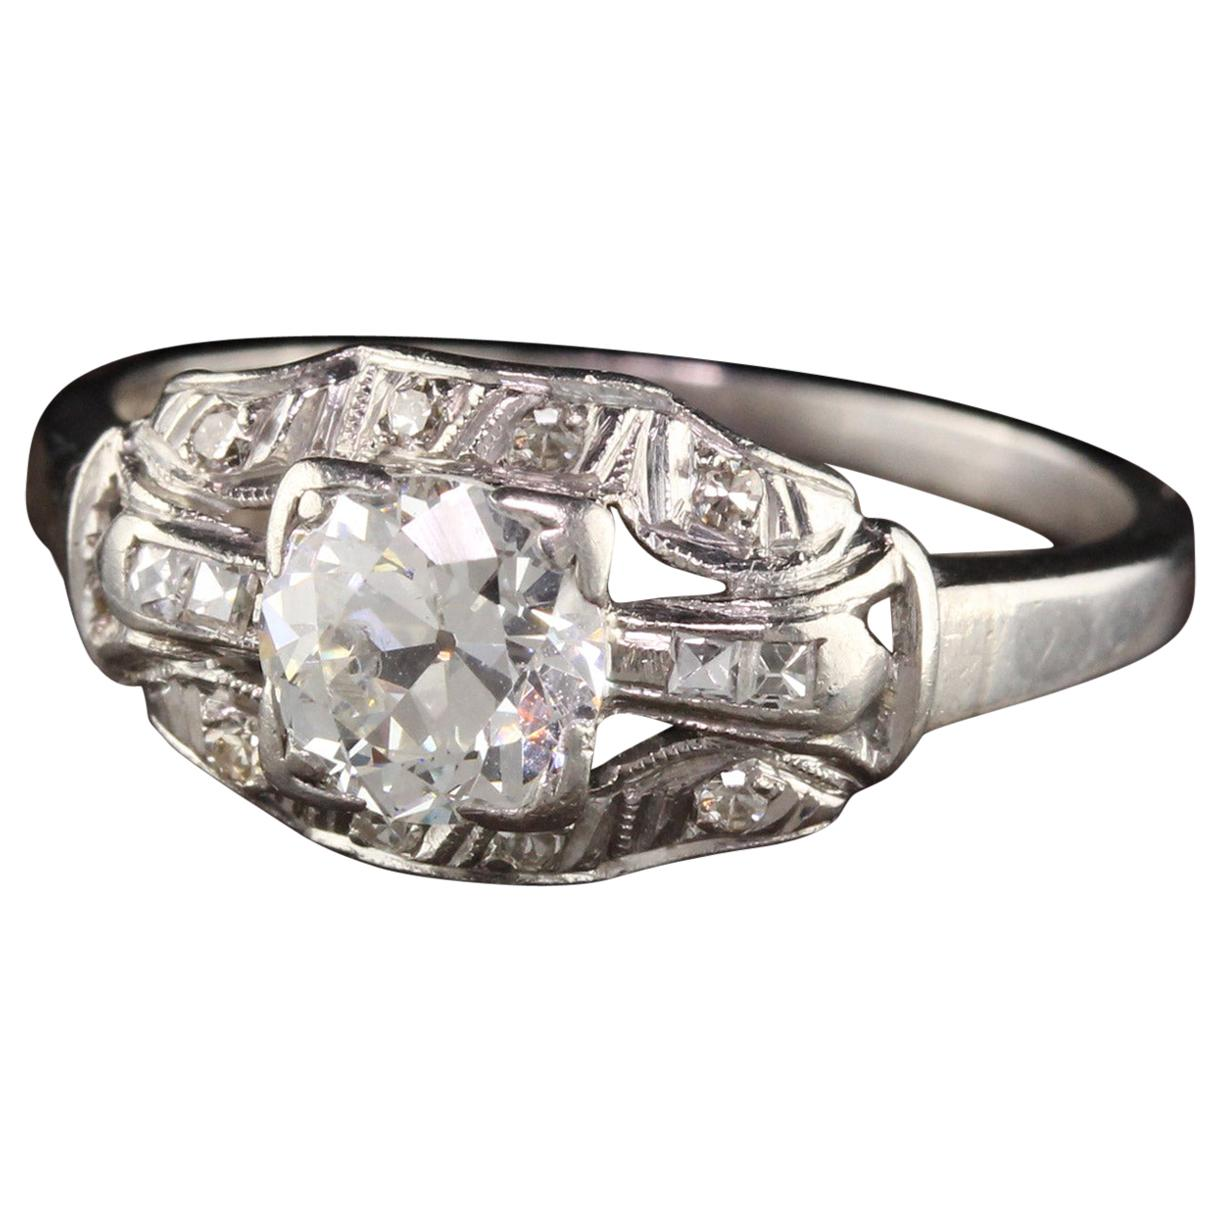 Antique Art Deco Platinum Old European Diamond French Cut Engagement Ring